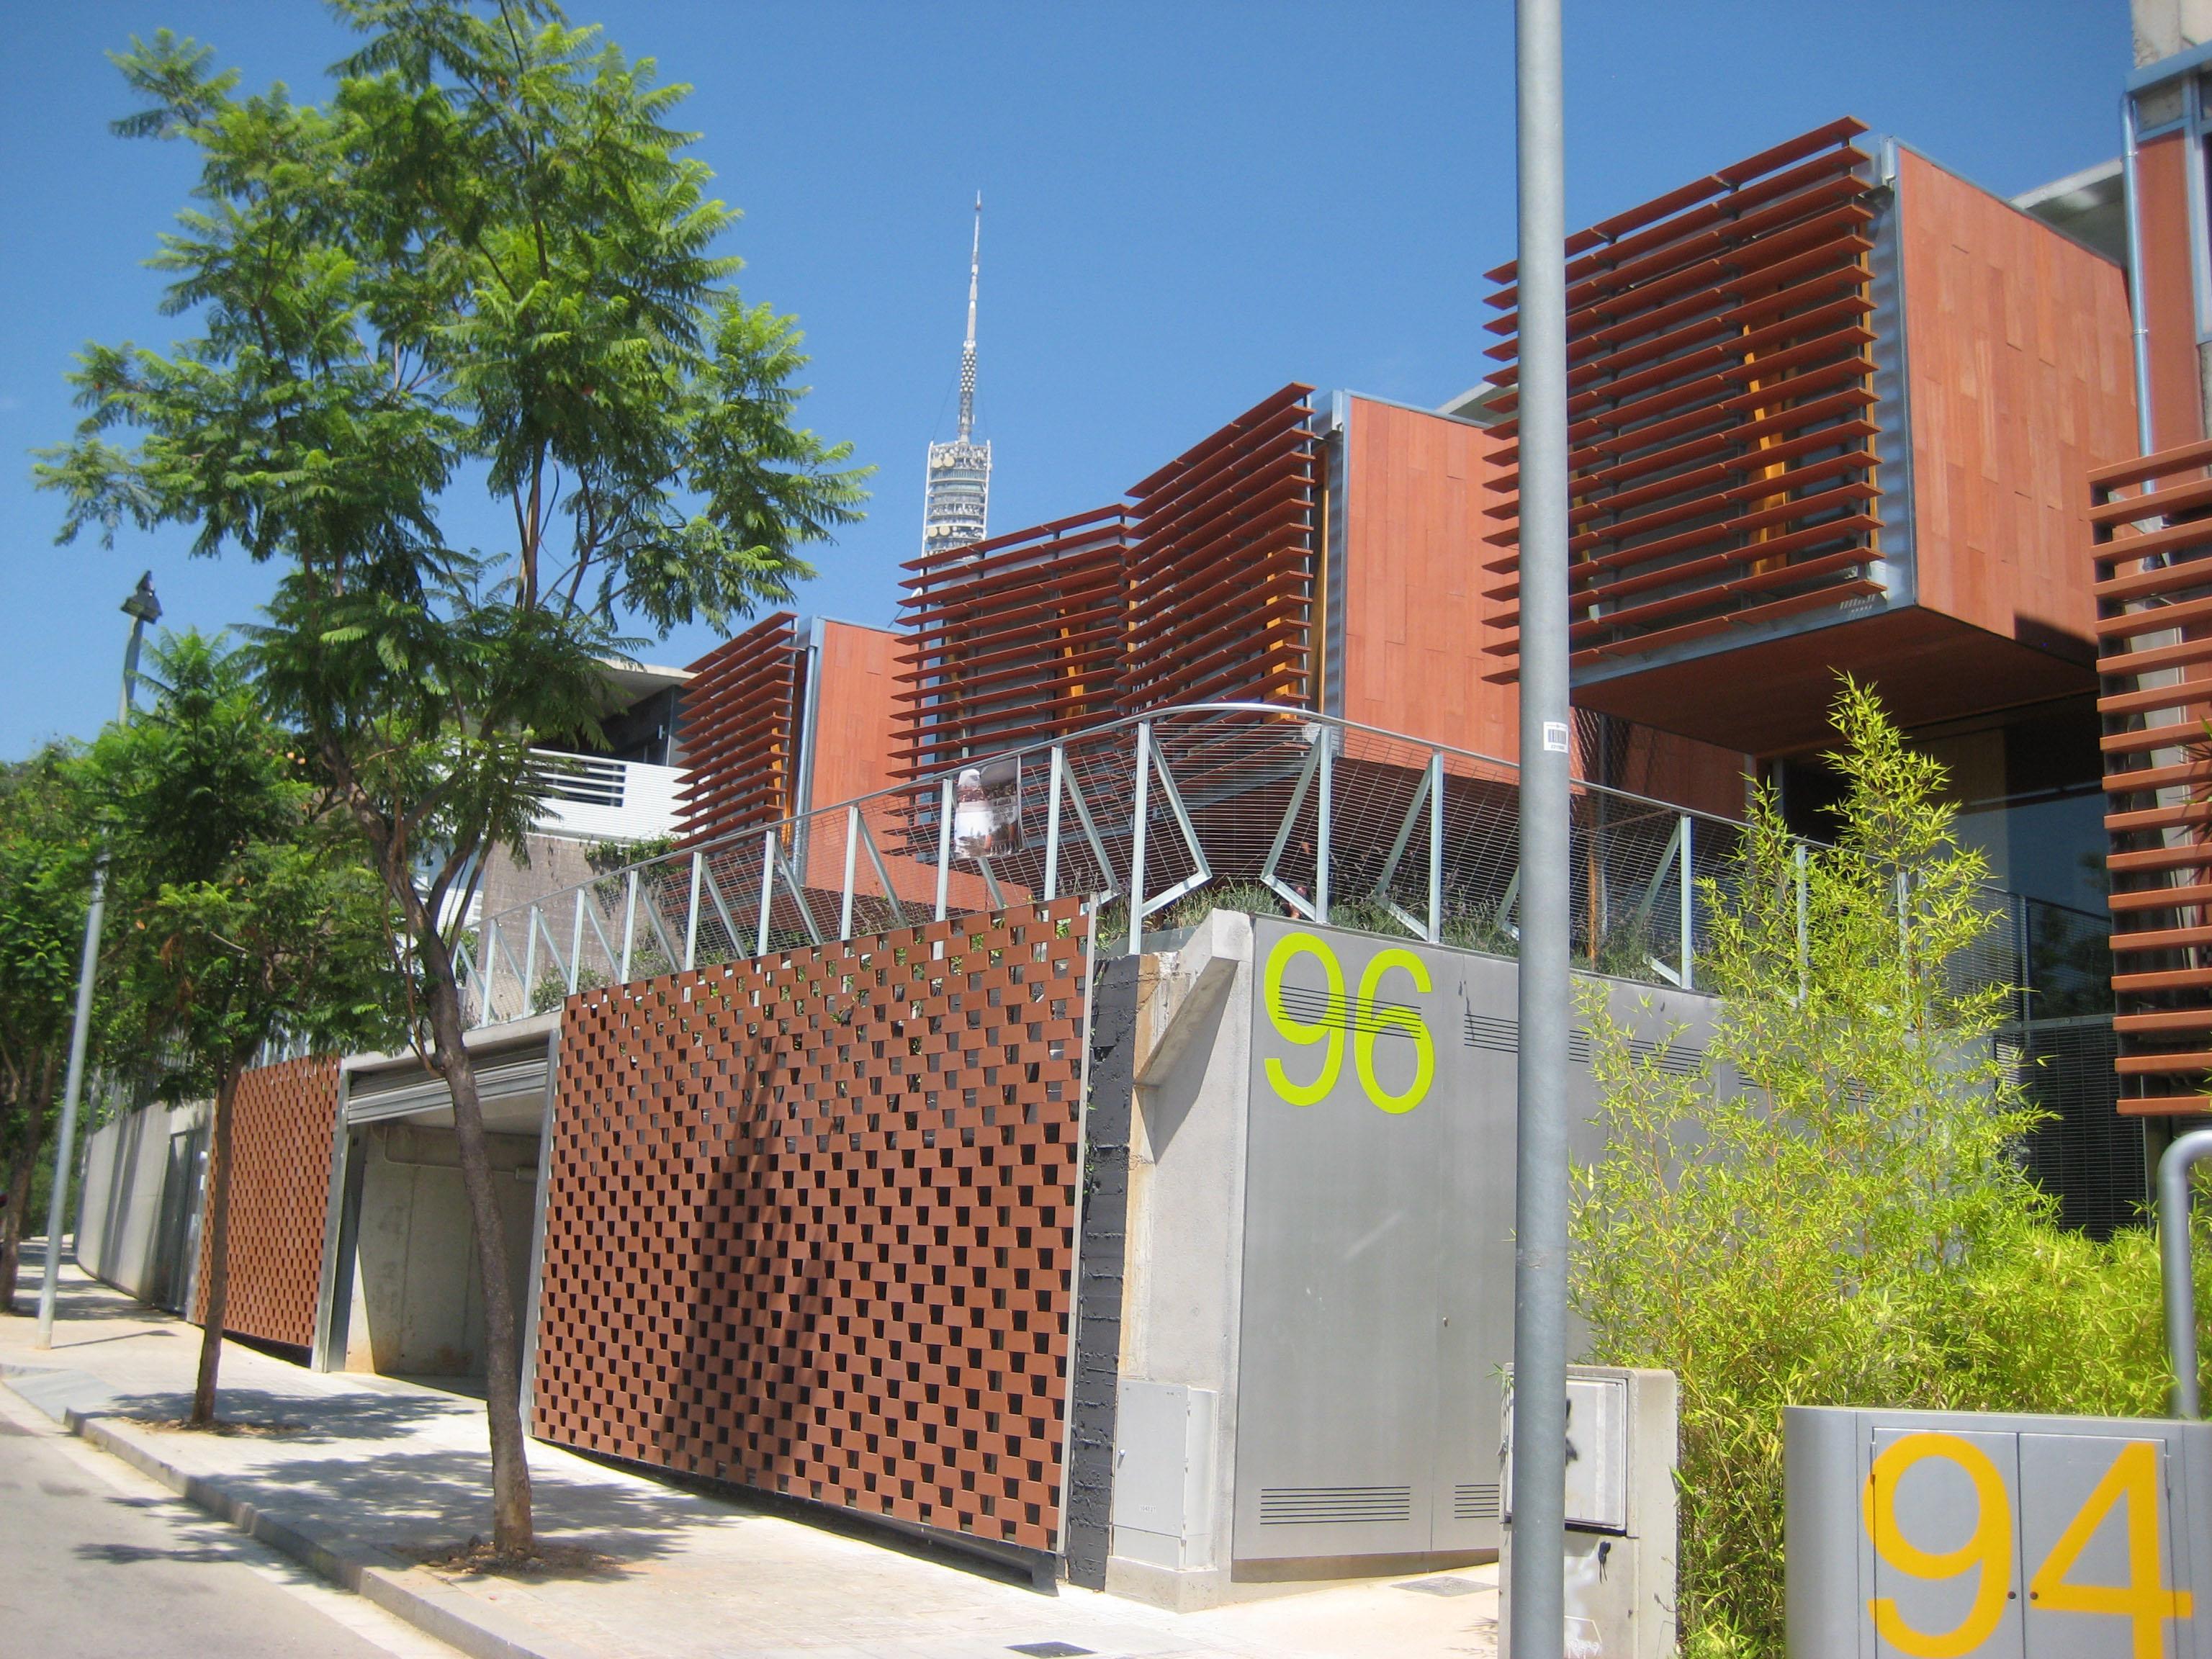 Casas pomaret en collserola metalocus - Natura casa barcelona ...